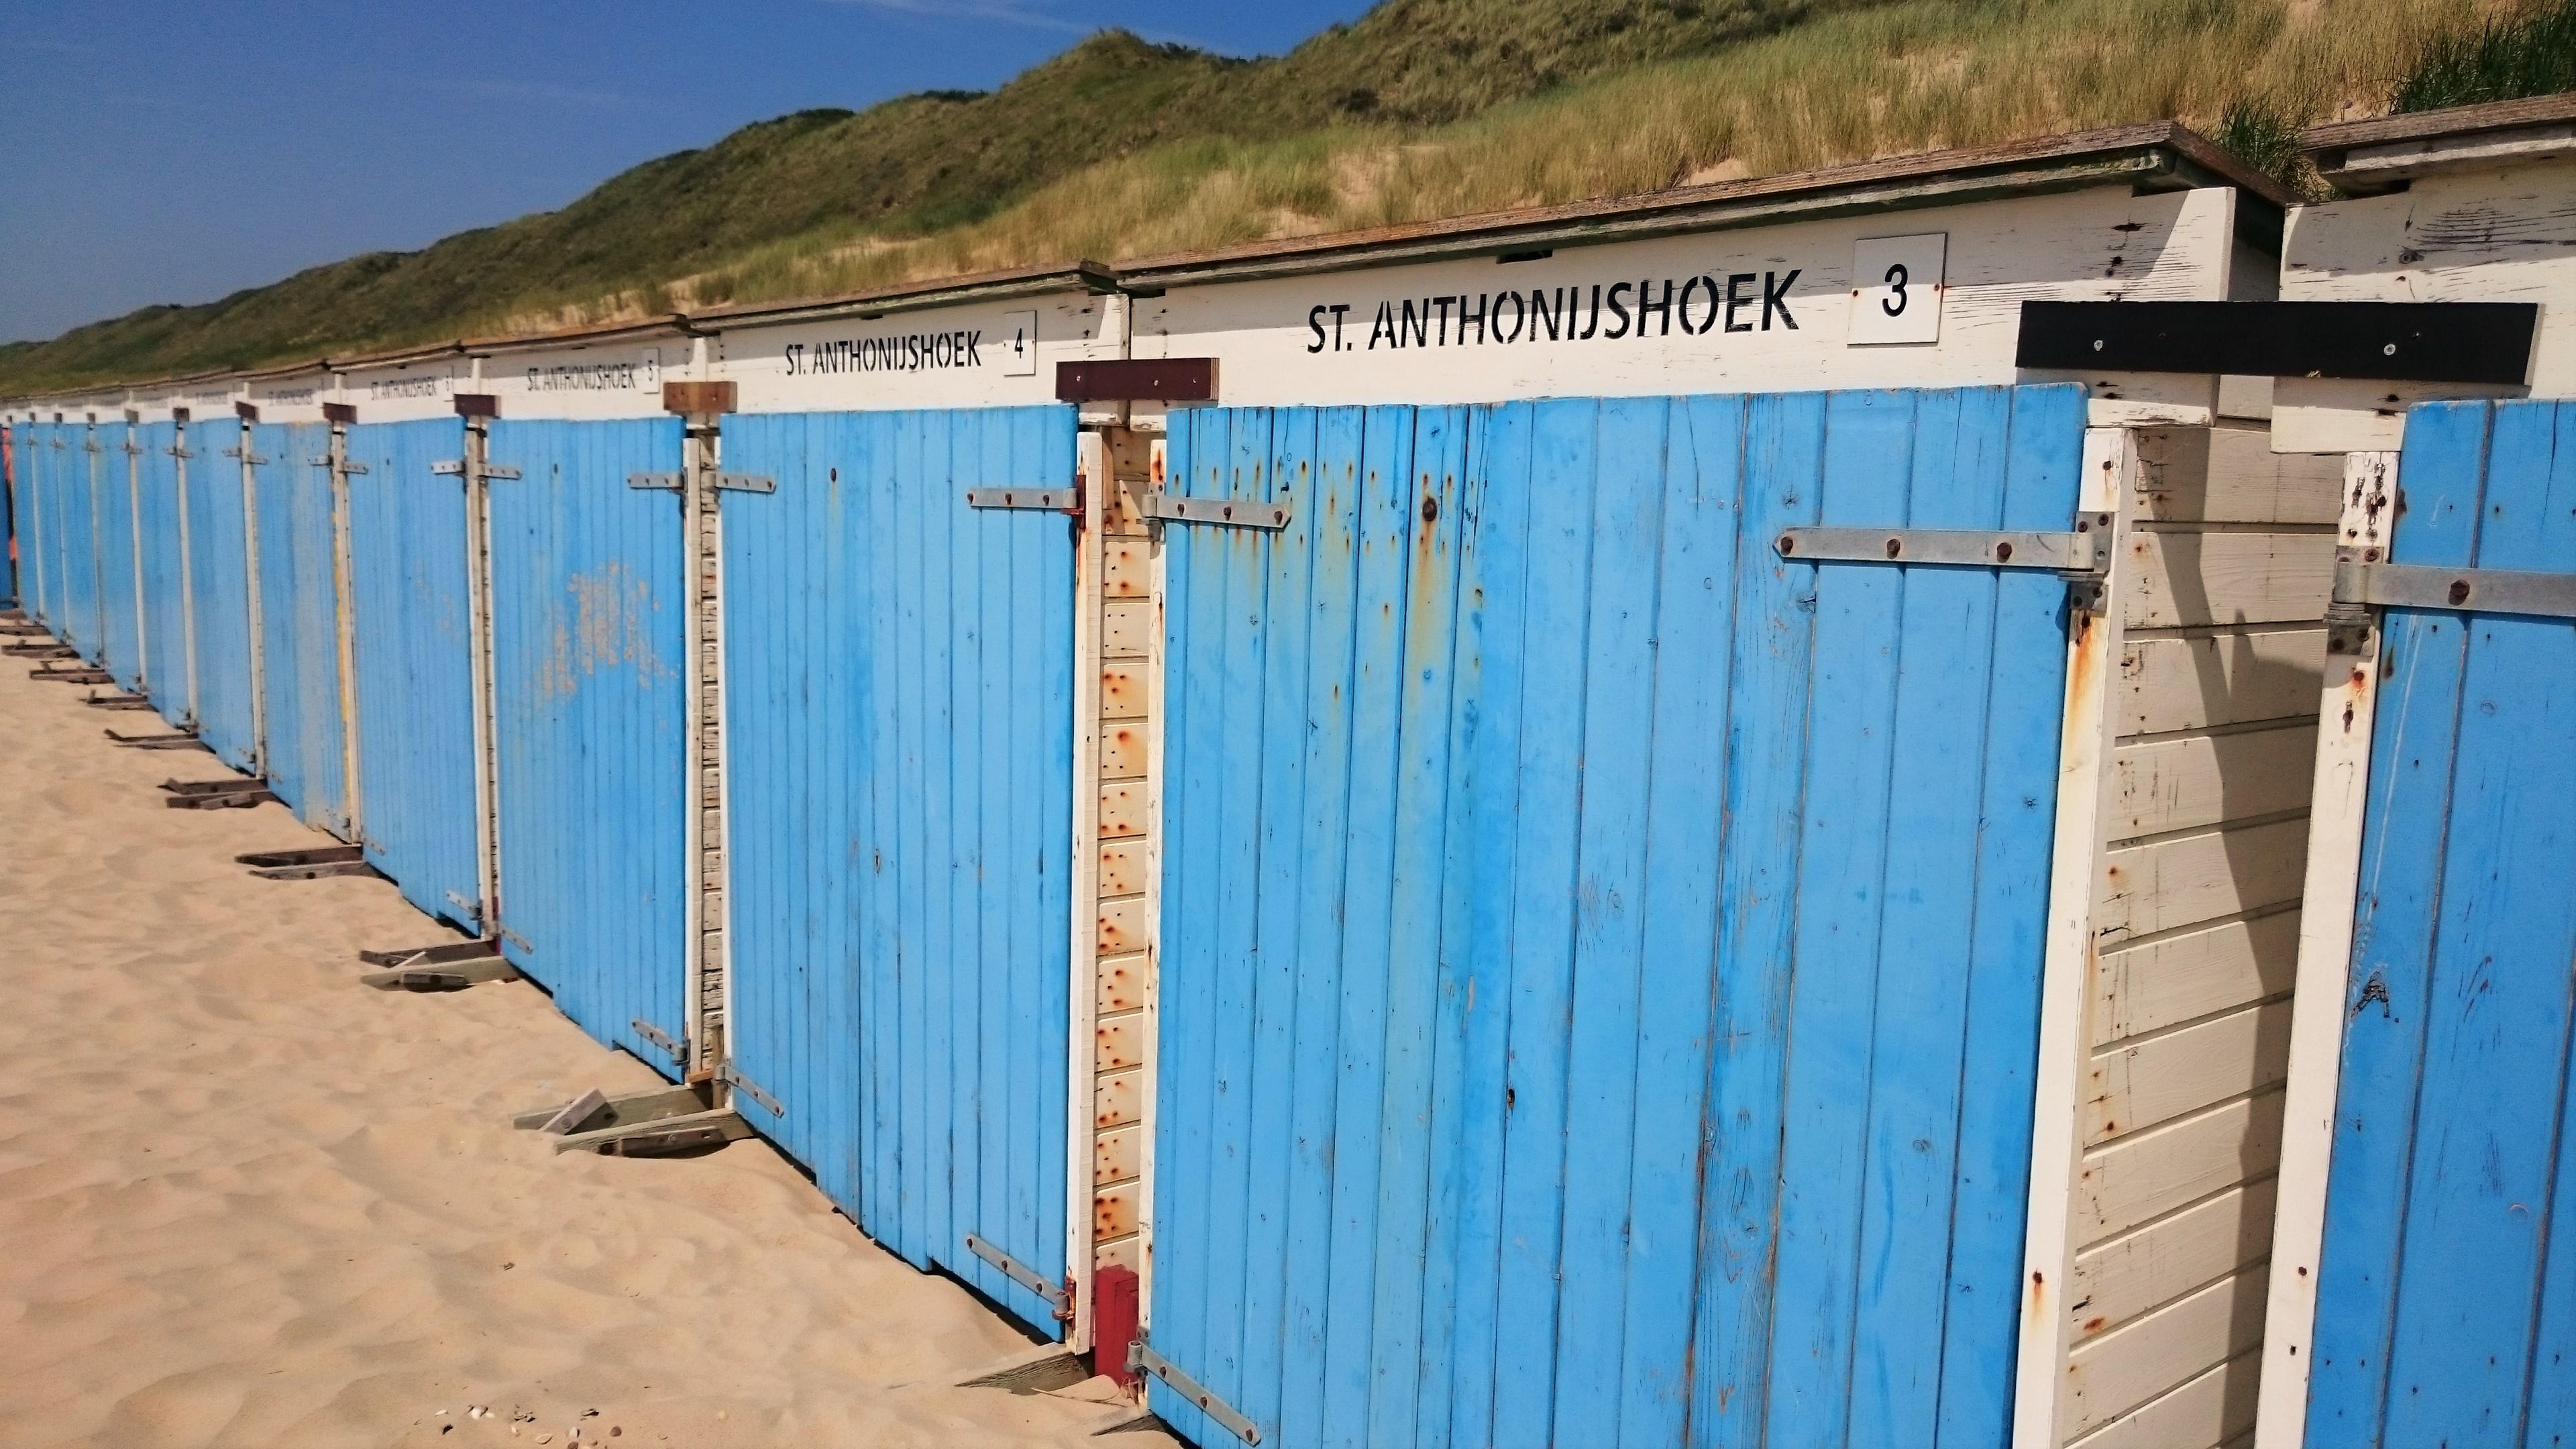 St. Anthonijshoek strandhuisjesverhuur | strandhuisjes.com